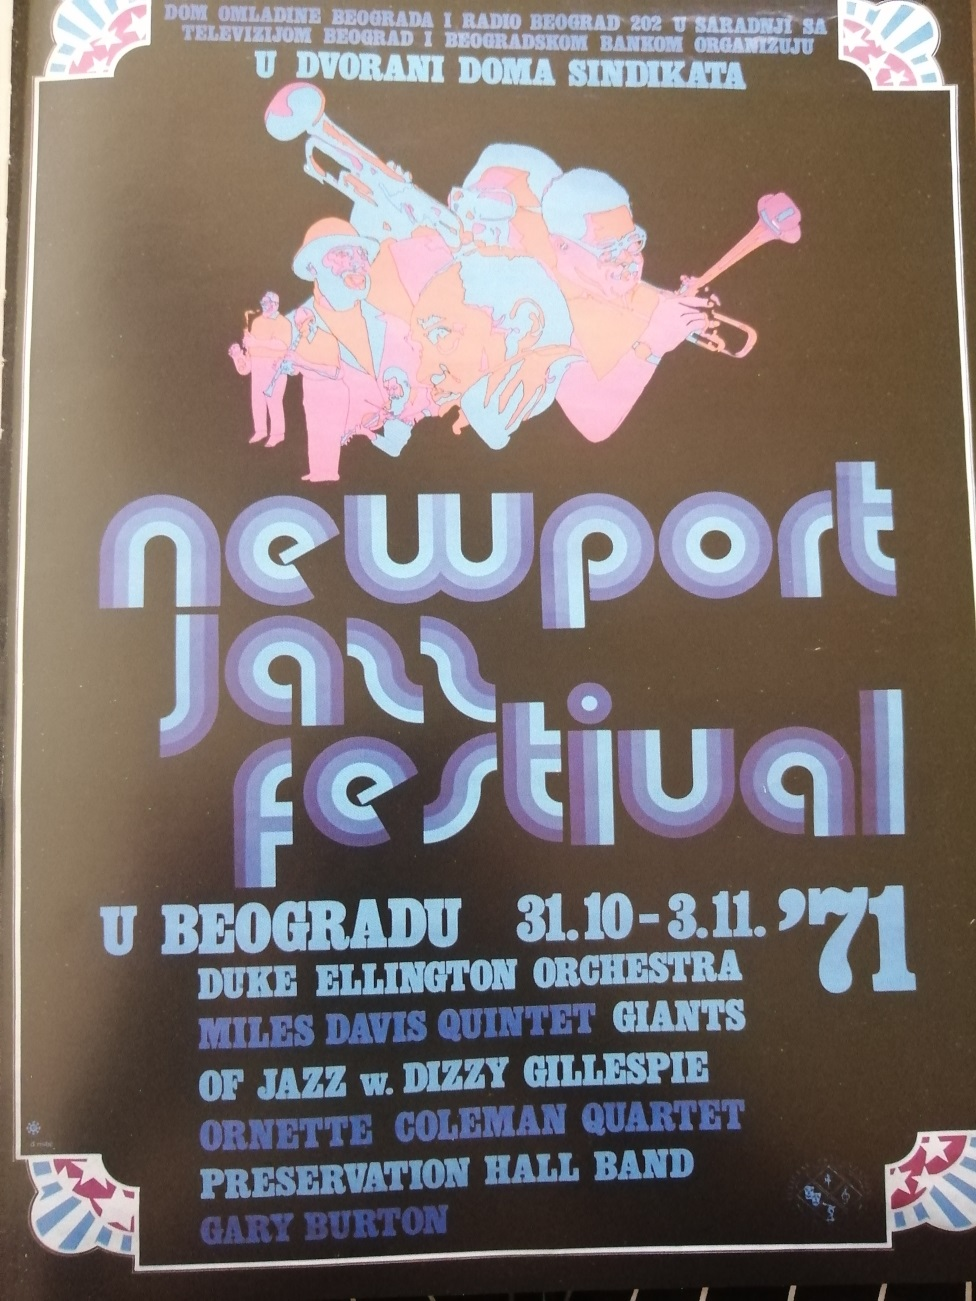 džez, Njuport festival